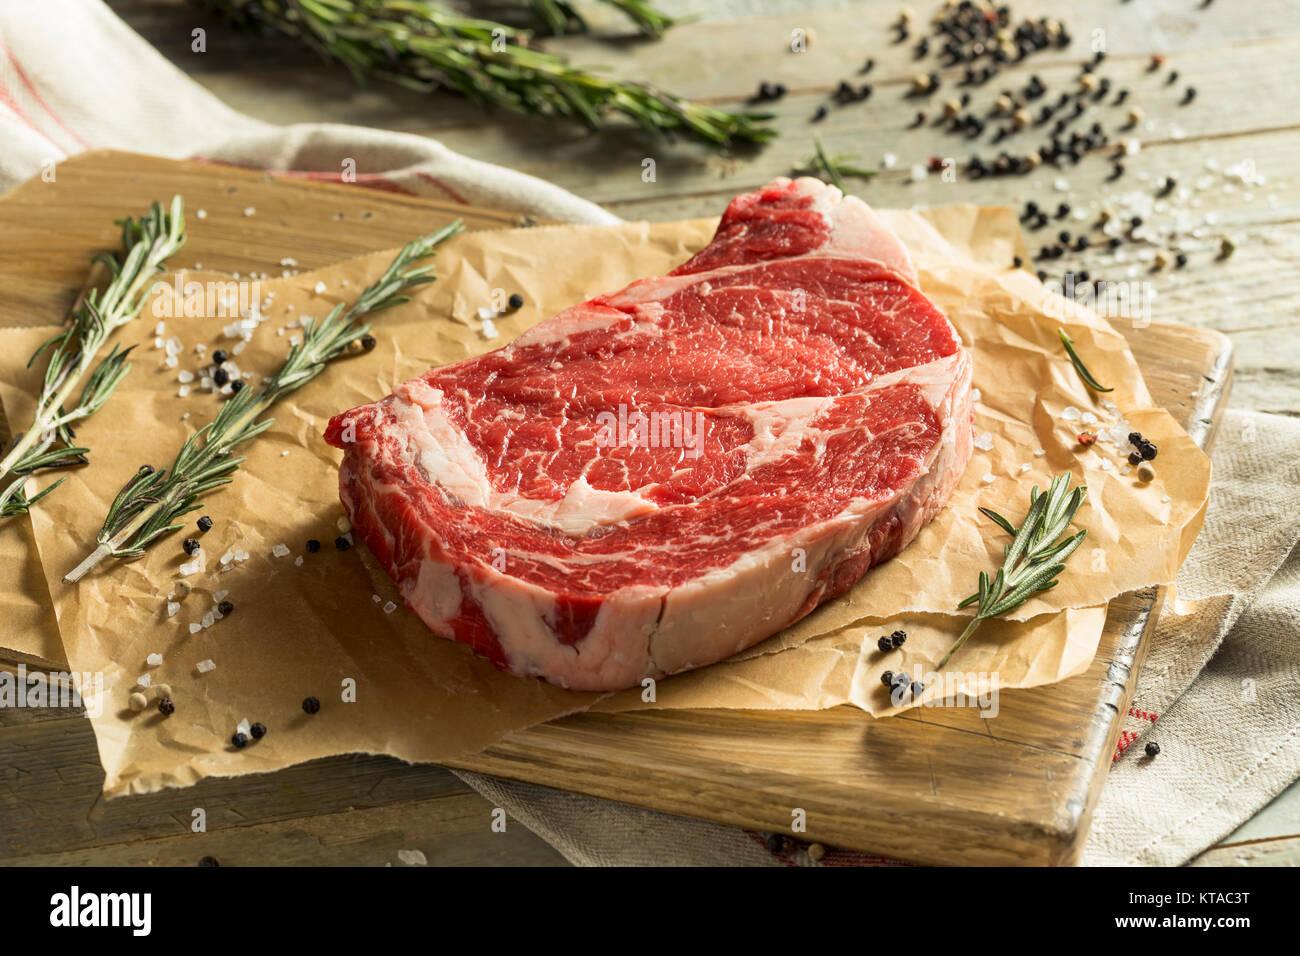 Raw Grass Fed Boneless Ribeye Steak Ready to Cook - Stock Image